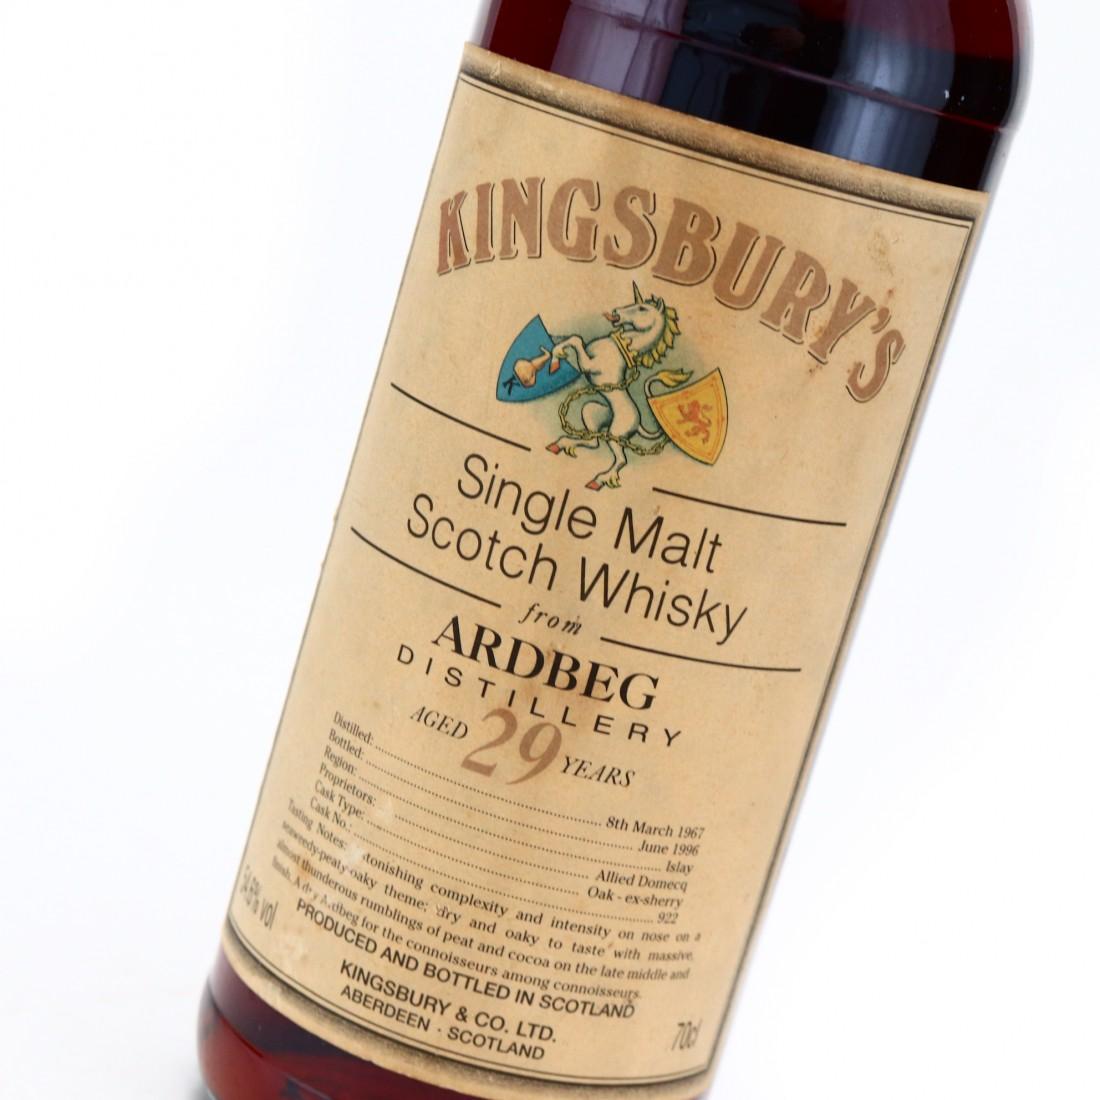 Ardbeg 1967 Kingsbury 29 Year Old #922